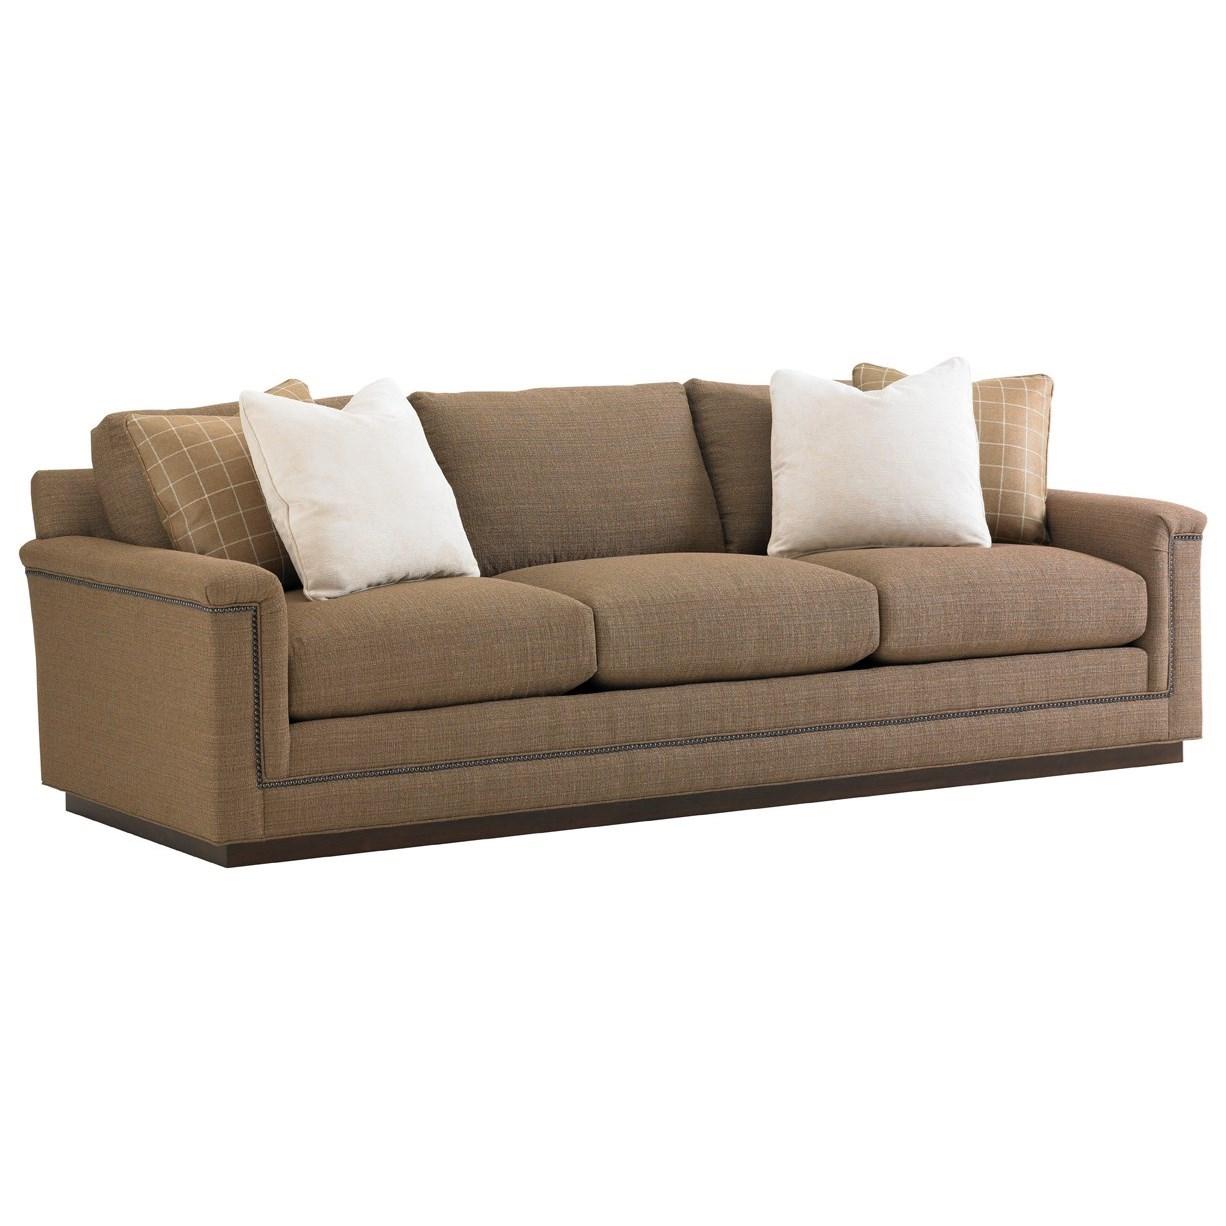 Lexington Upholstery Balance Sofa by Lexington at Jacksonville Furniture Mart